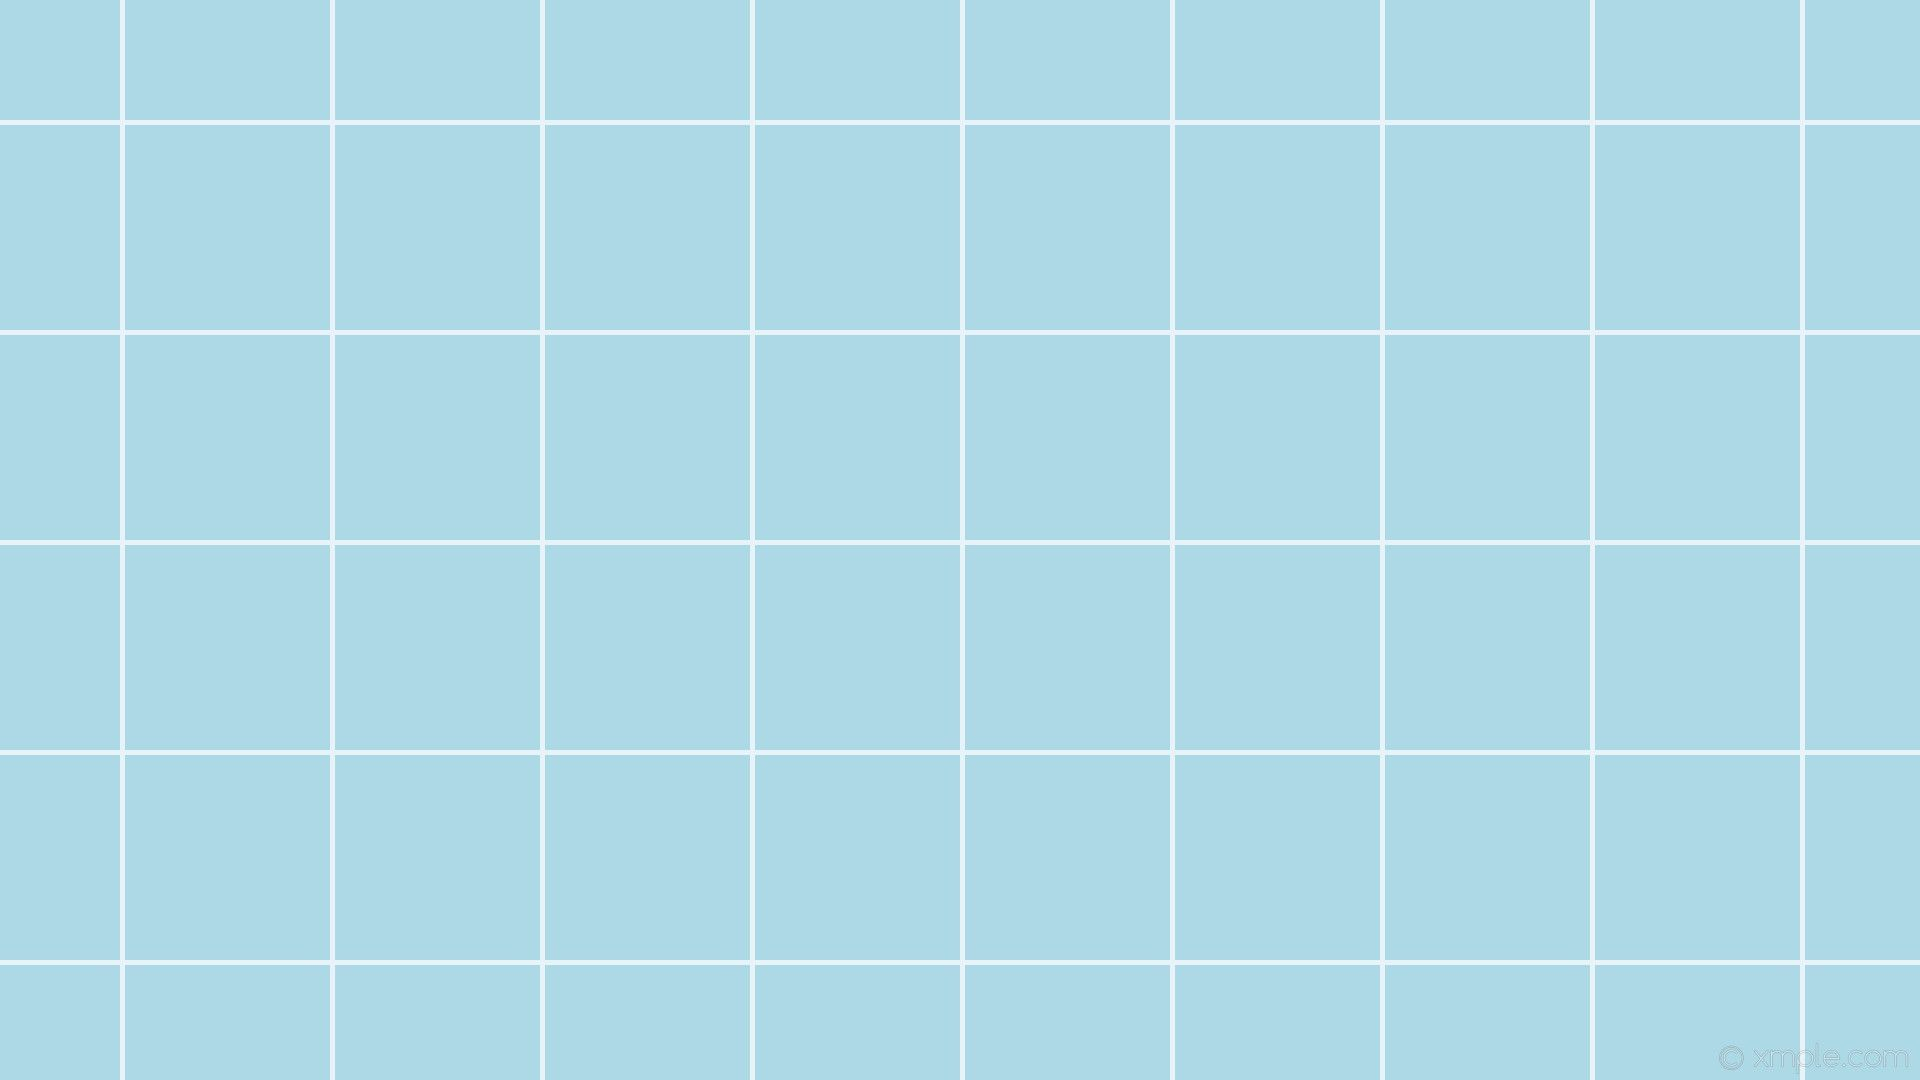 Pastel Blue Aesthetics Desktop Wallpapers On Wallpaperdog In 2020 Cute Desktop Wallpaper Aesthetic Pastel Wallpaper Aesthetic Desktop Wallpaper